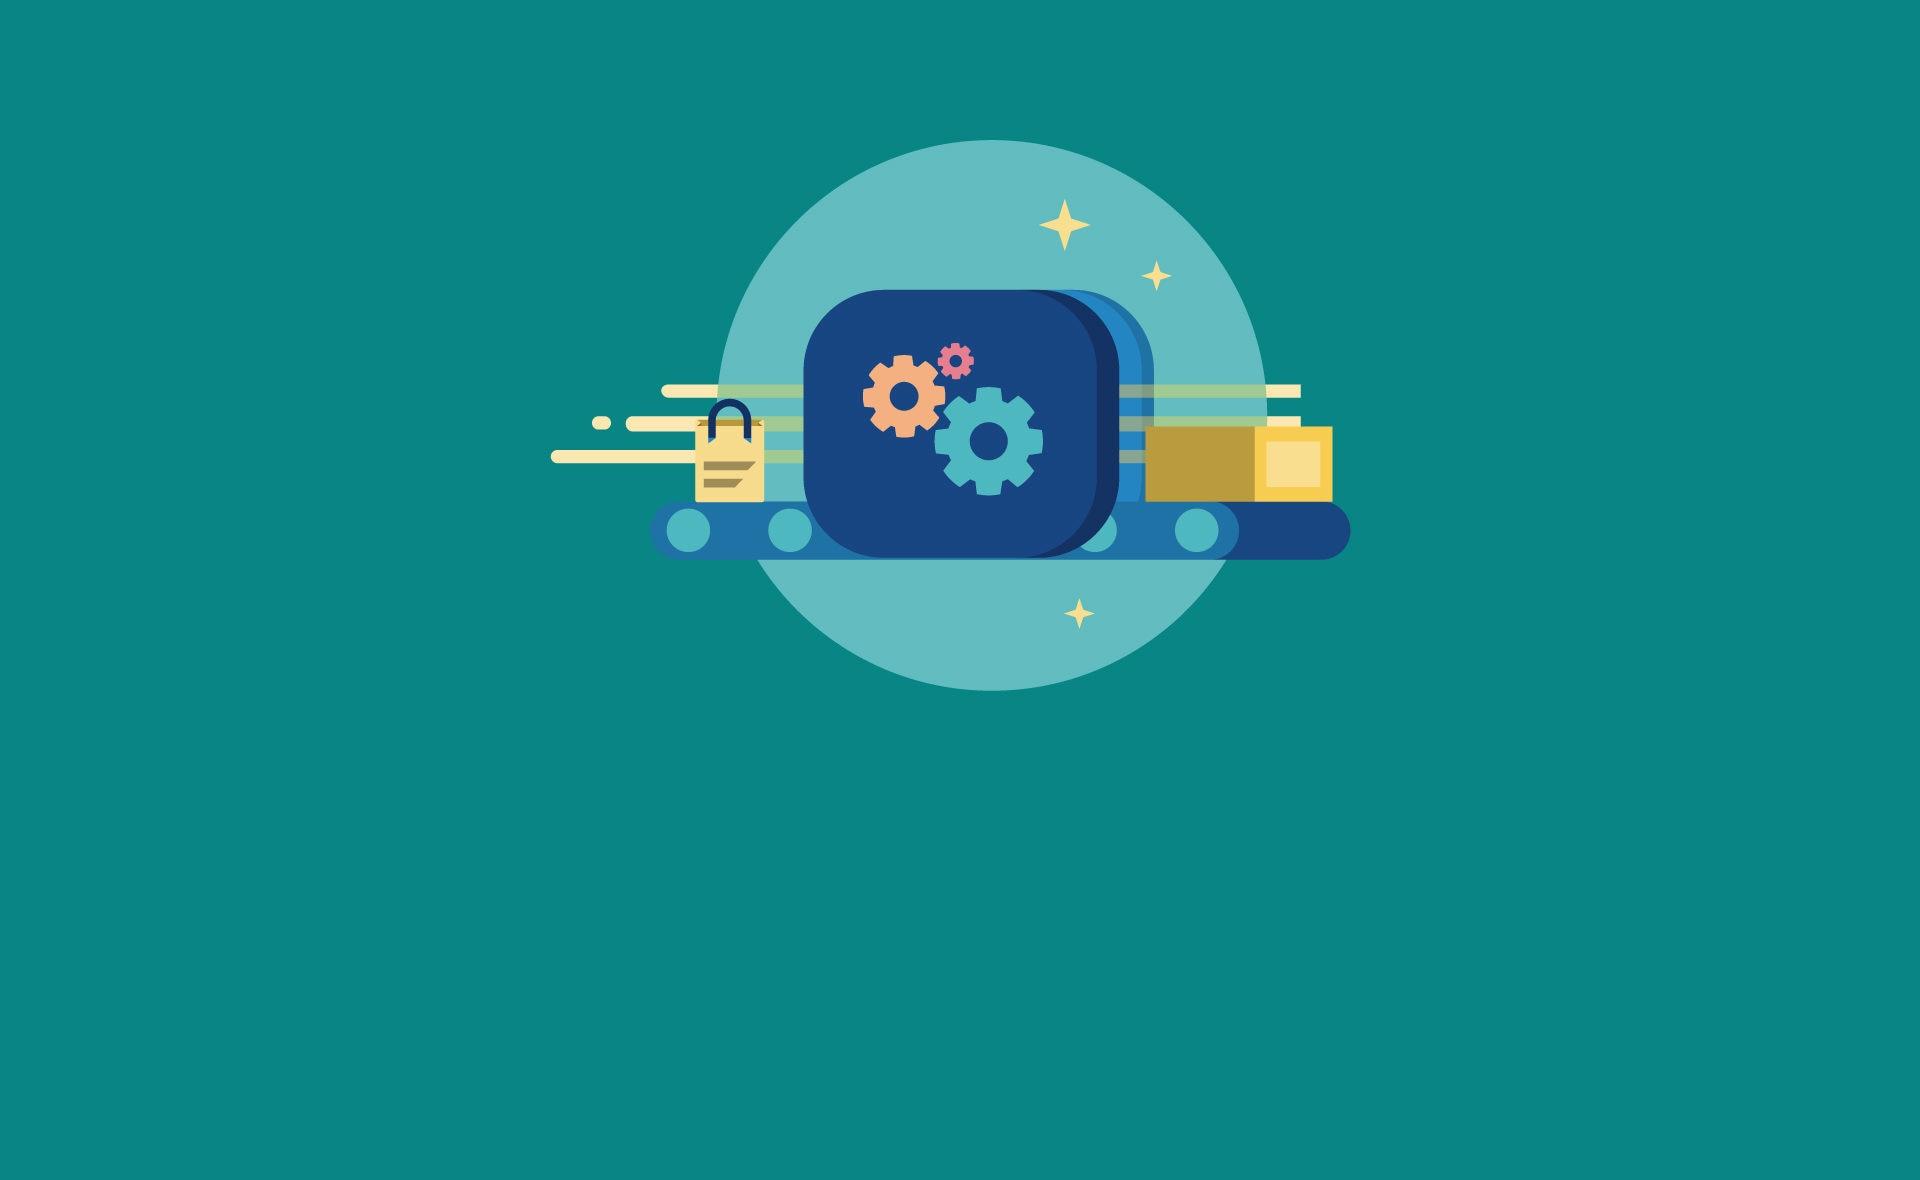 fintech-avances-digital-mercado-trabajo-hardware-software-recurso-BBVA